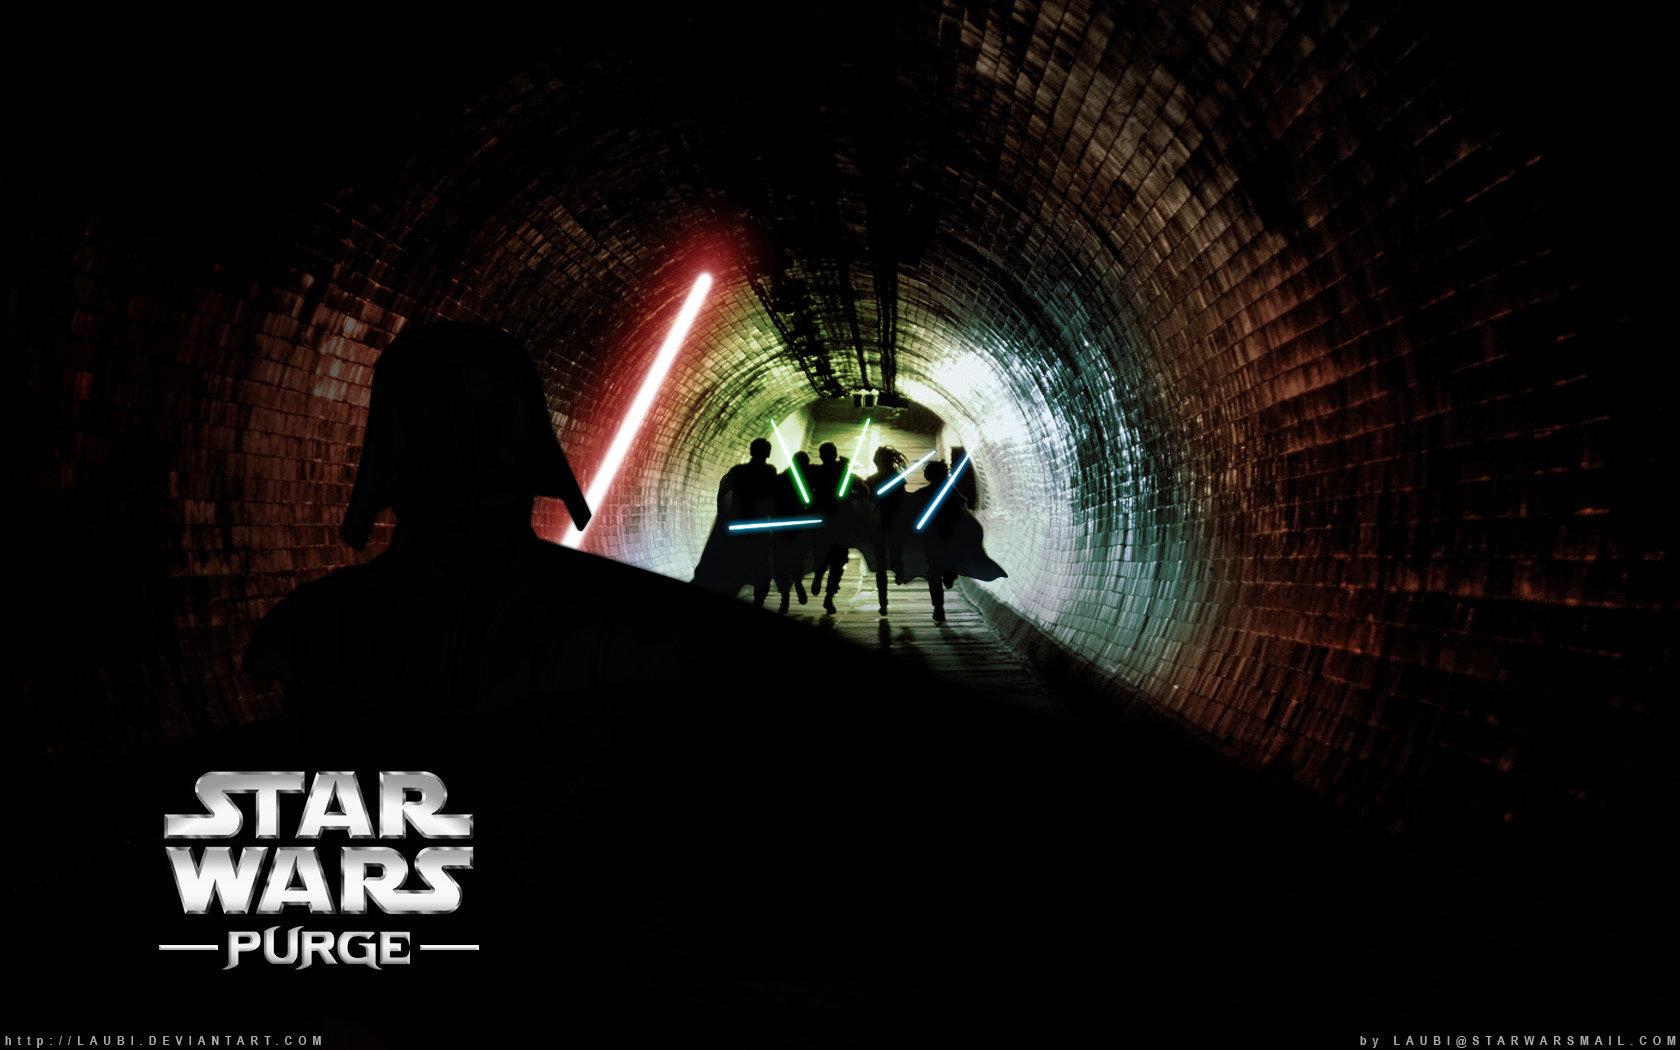 Free Download Star Wars Wallpaper ID459550 Hd 1680x1050 For PC